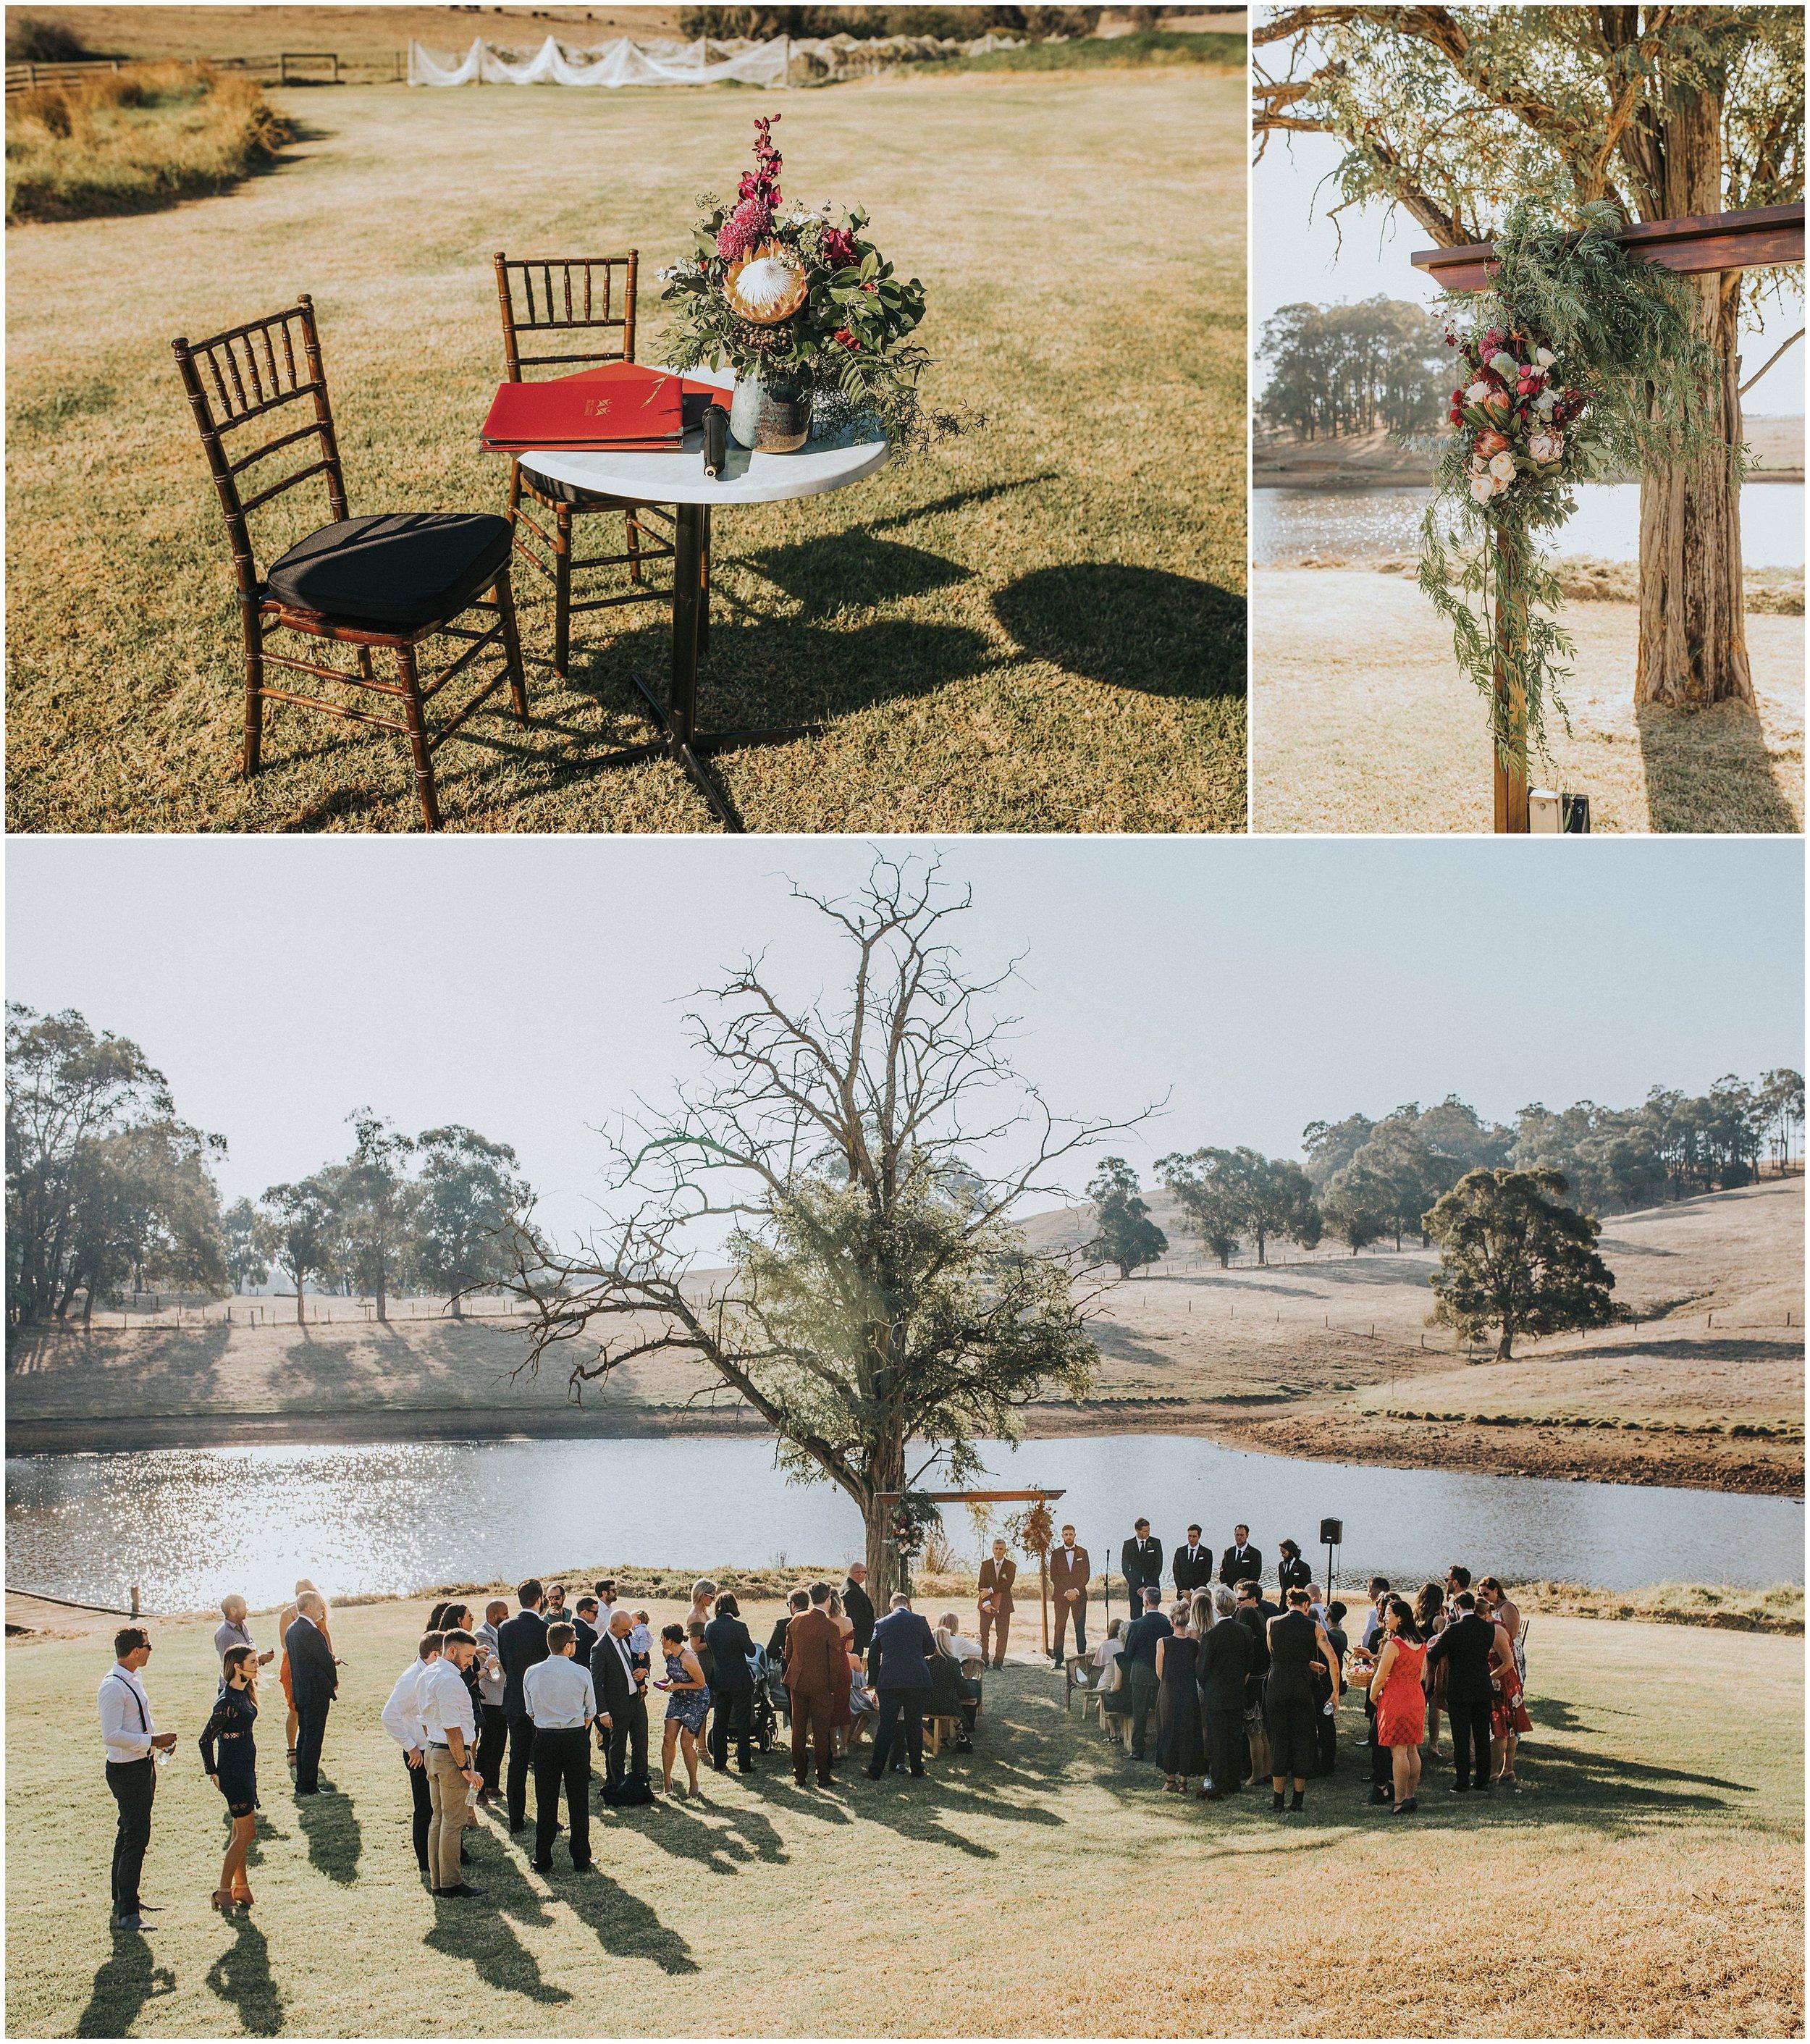 ferguson_valley_perth_wedding_photgorapher_keeper_creative_12.JPG